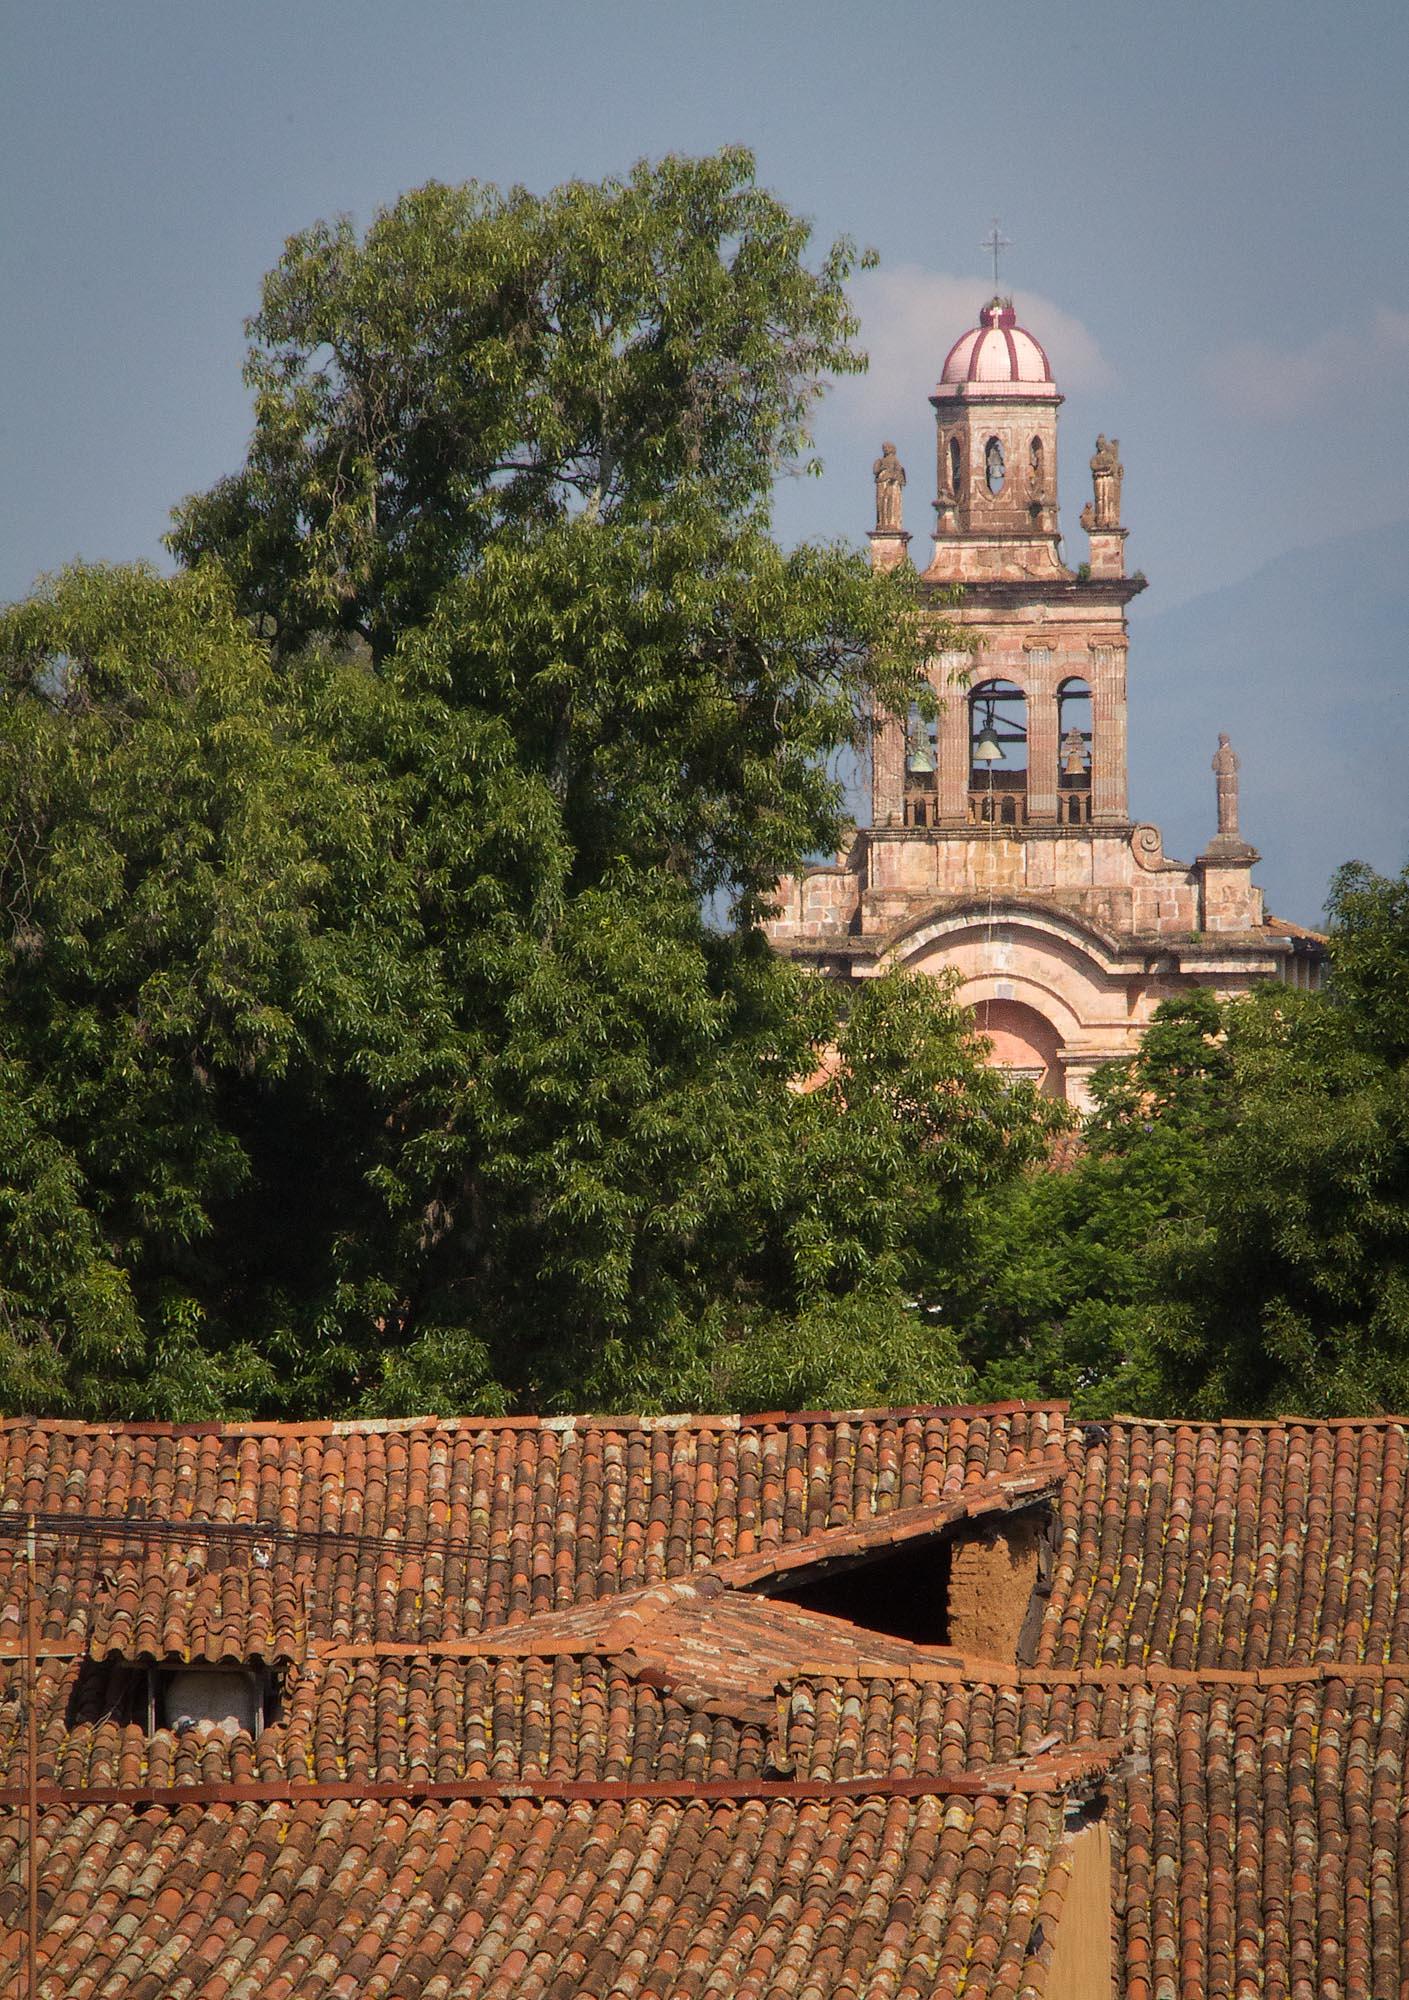 Faith Lift   CantoyaFest: Pátzcuaro, Michoacán, Mexico — Saturday, July 22, 2017